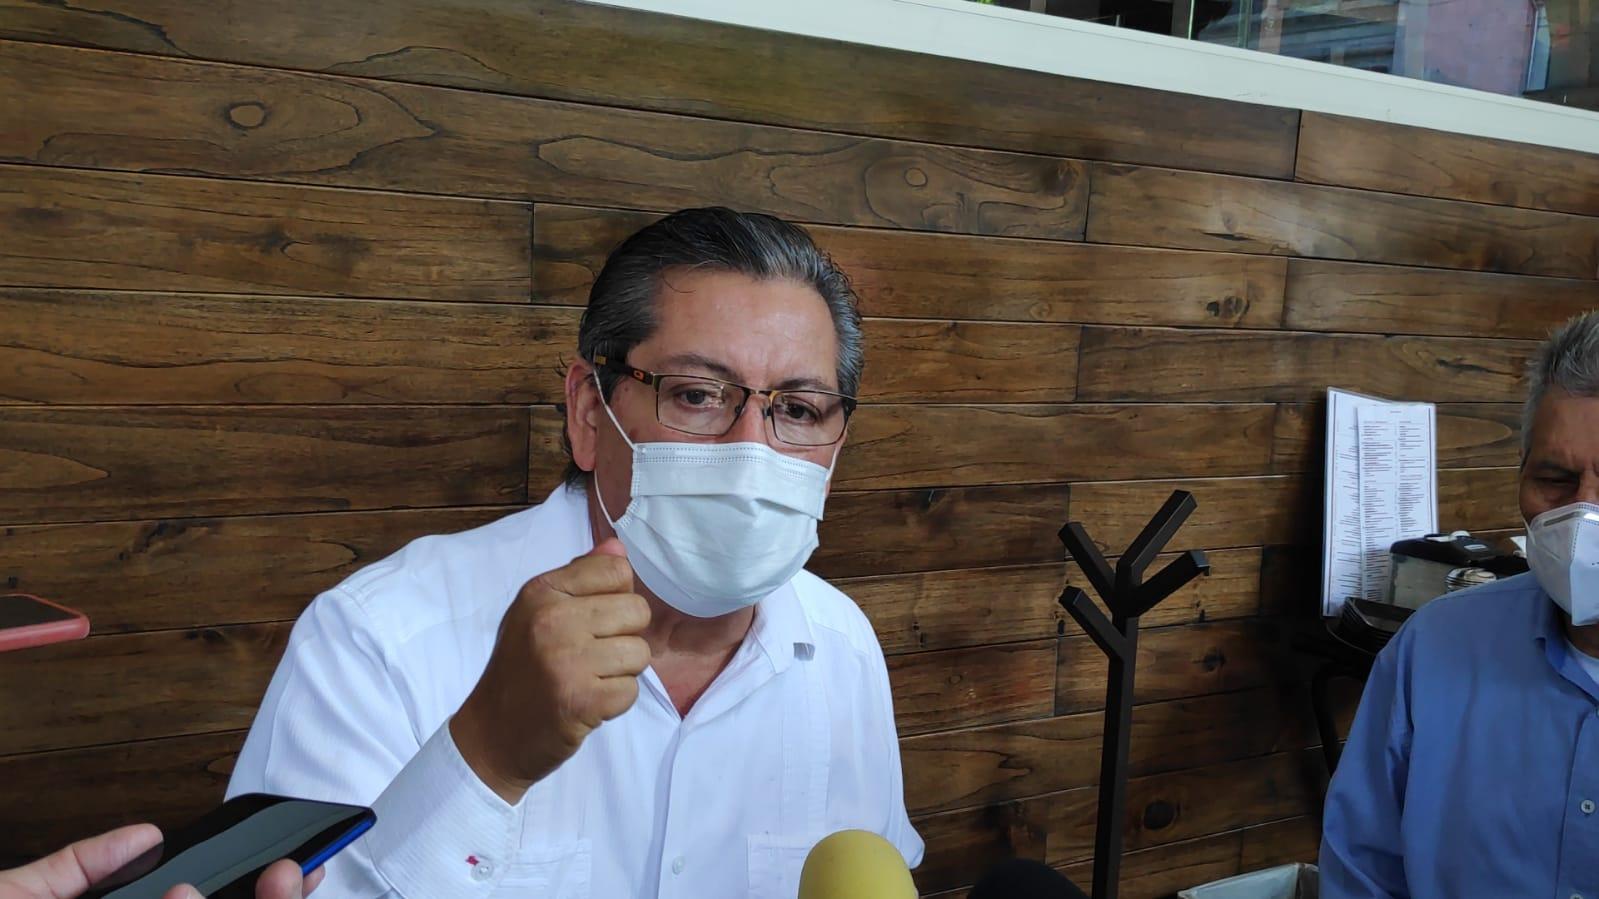 Advierte Red Evangélica de Veracruz que 1 millón de fieles votarán en contra de candidatos que no estén a favor de la vida